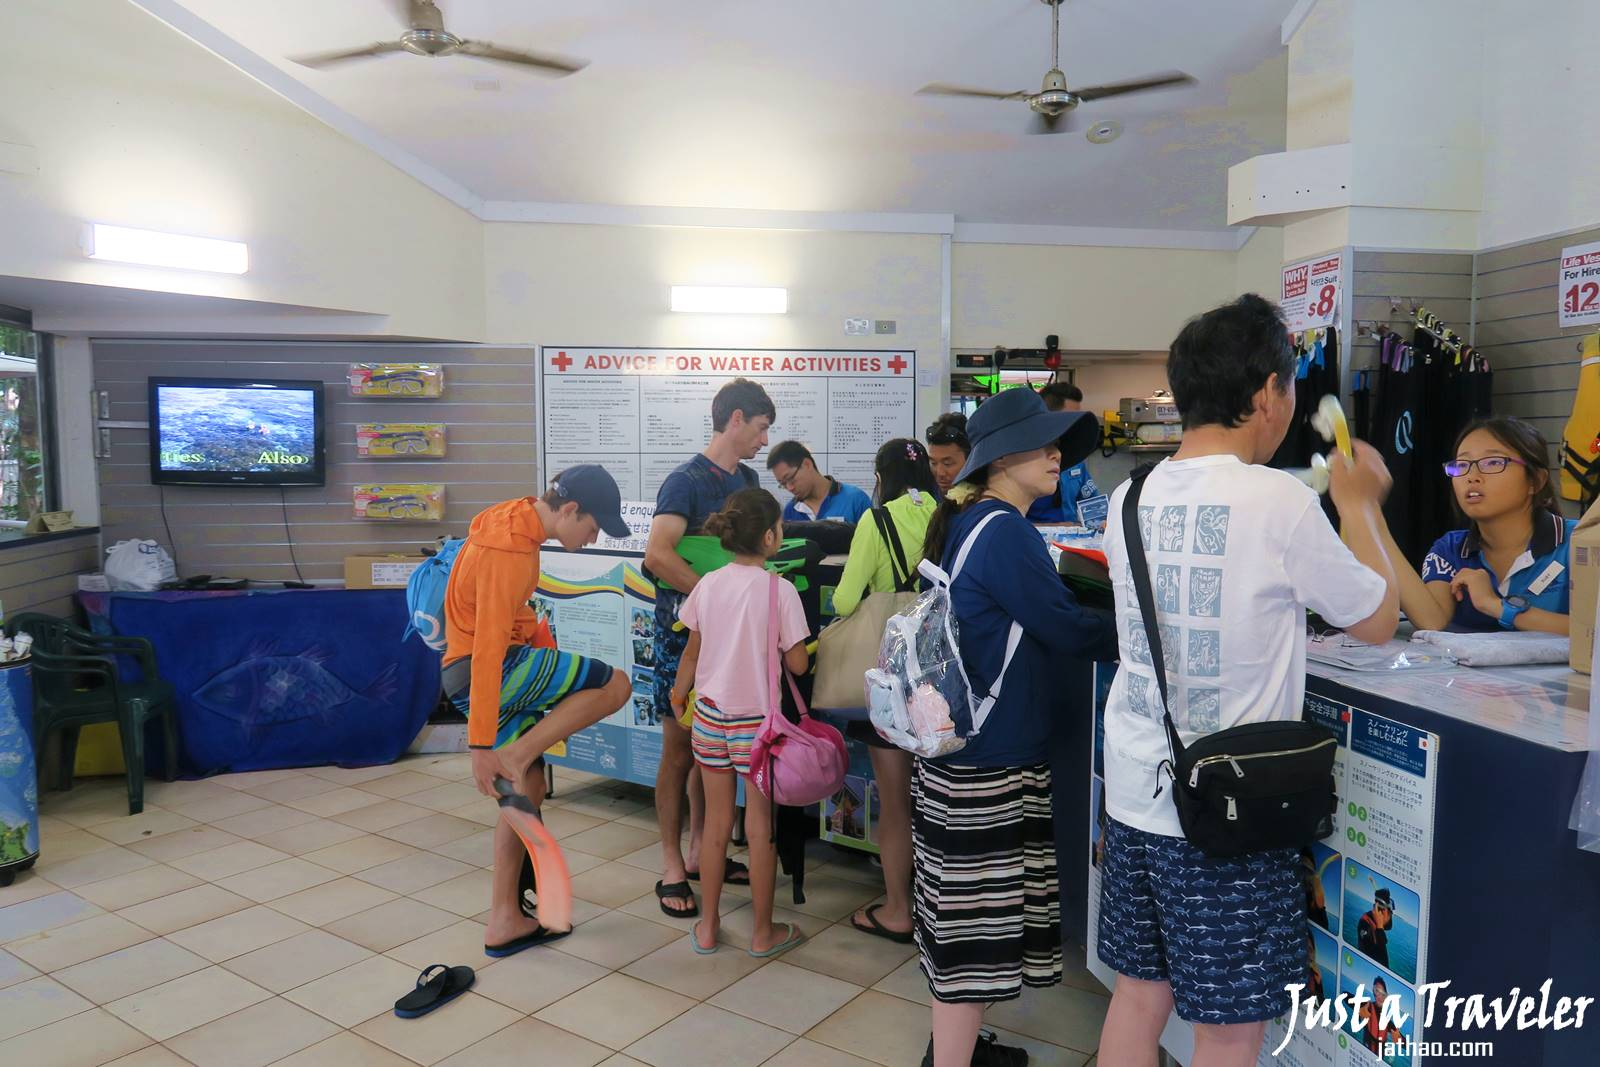 凱恩斯-大堡礁-綠島-內堡礁-浮潛-潛水-推薦-旅遊-自由行-澳洲-Carins-Great-Barrier-Reef-Green-Island-Snorkel-Diving-Travel-Australia